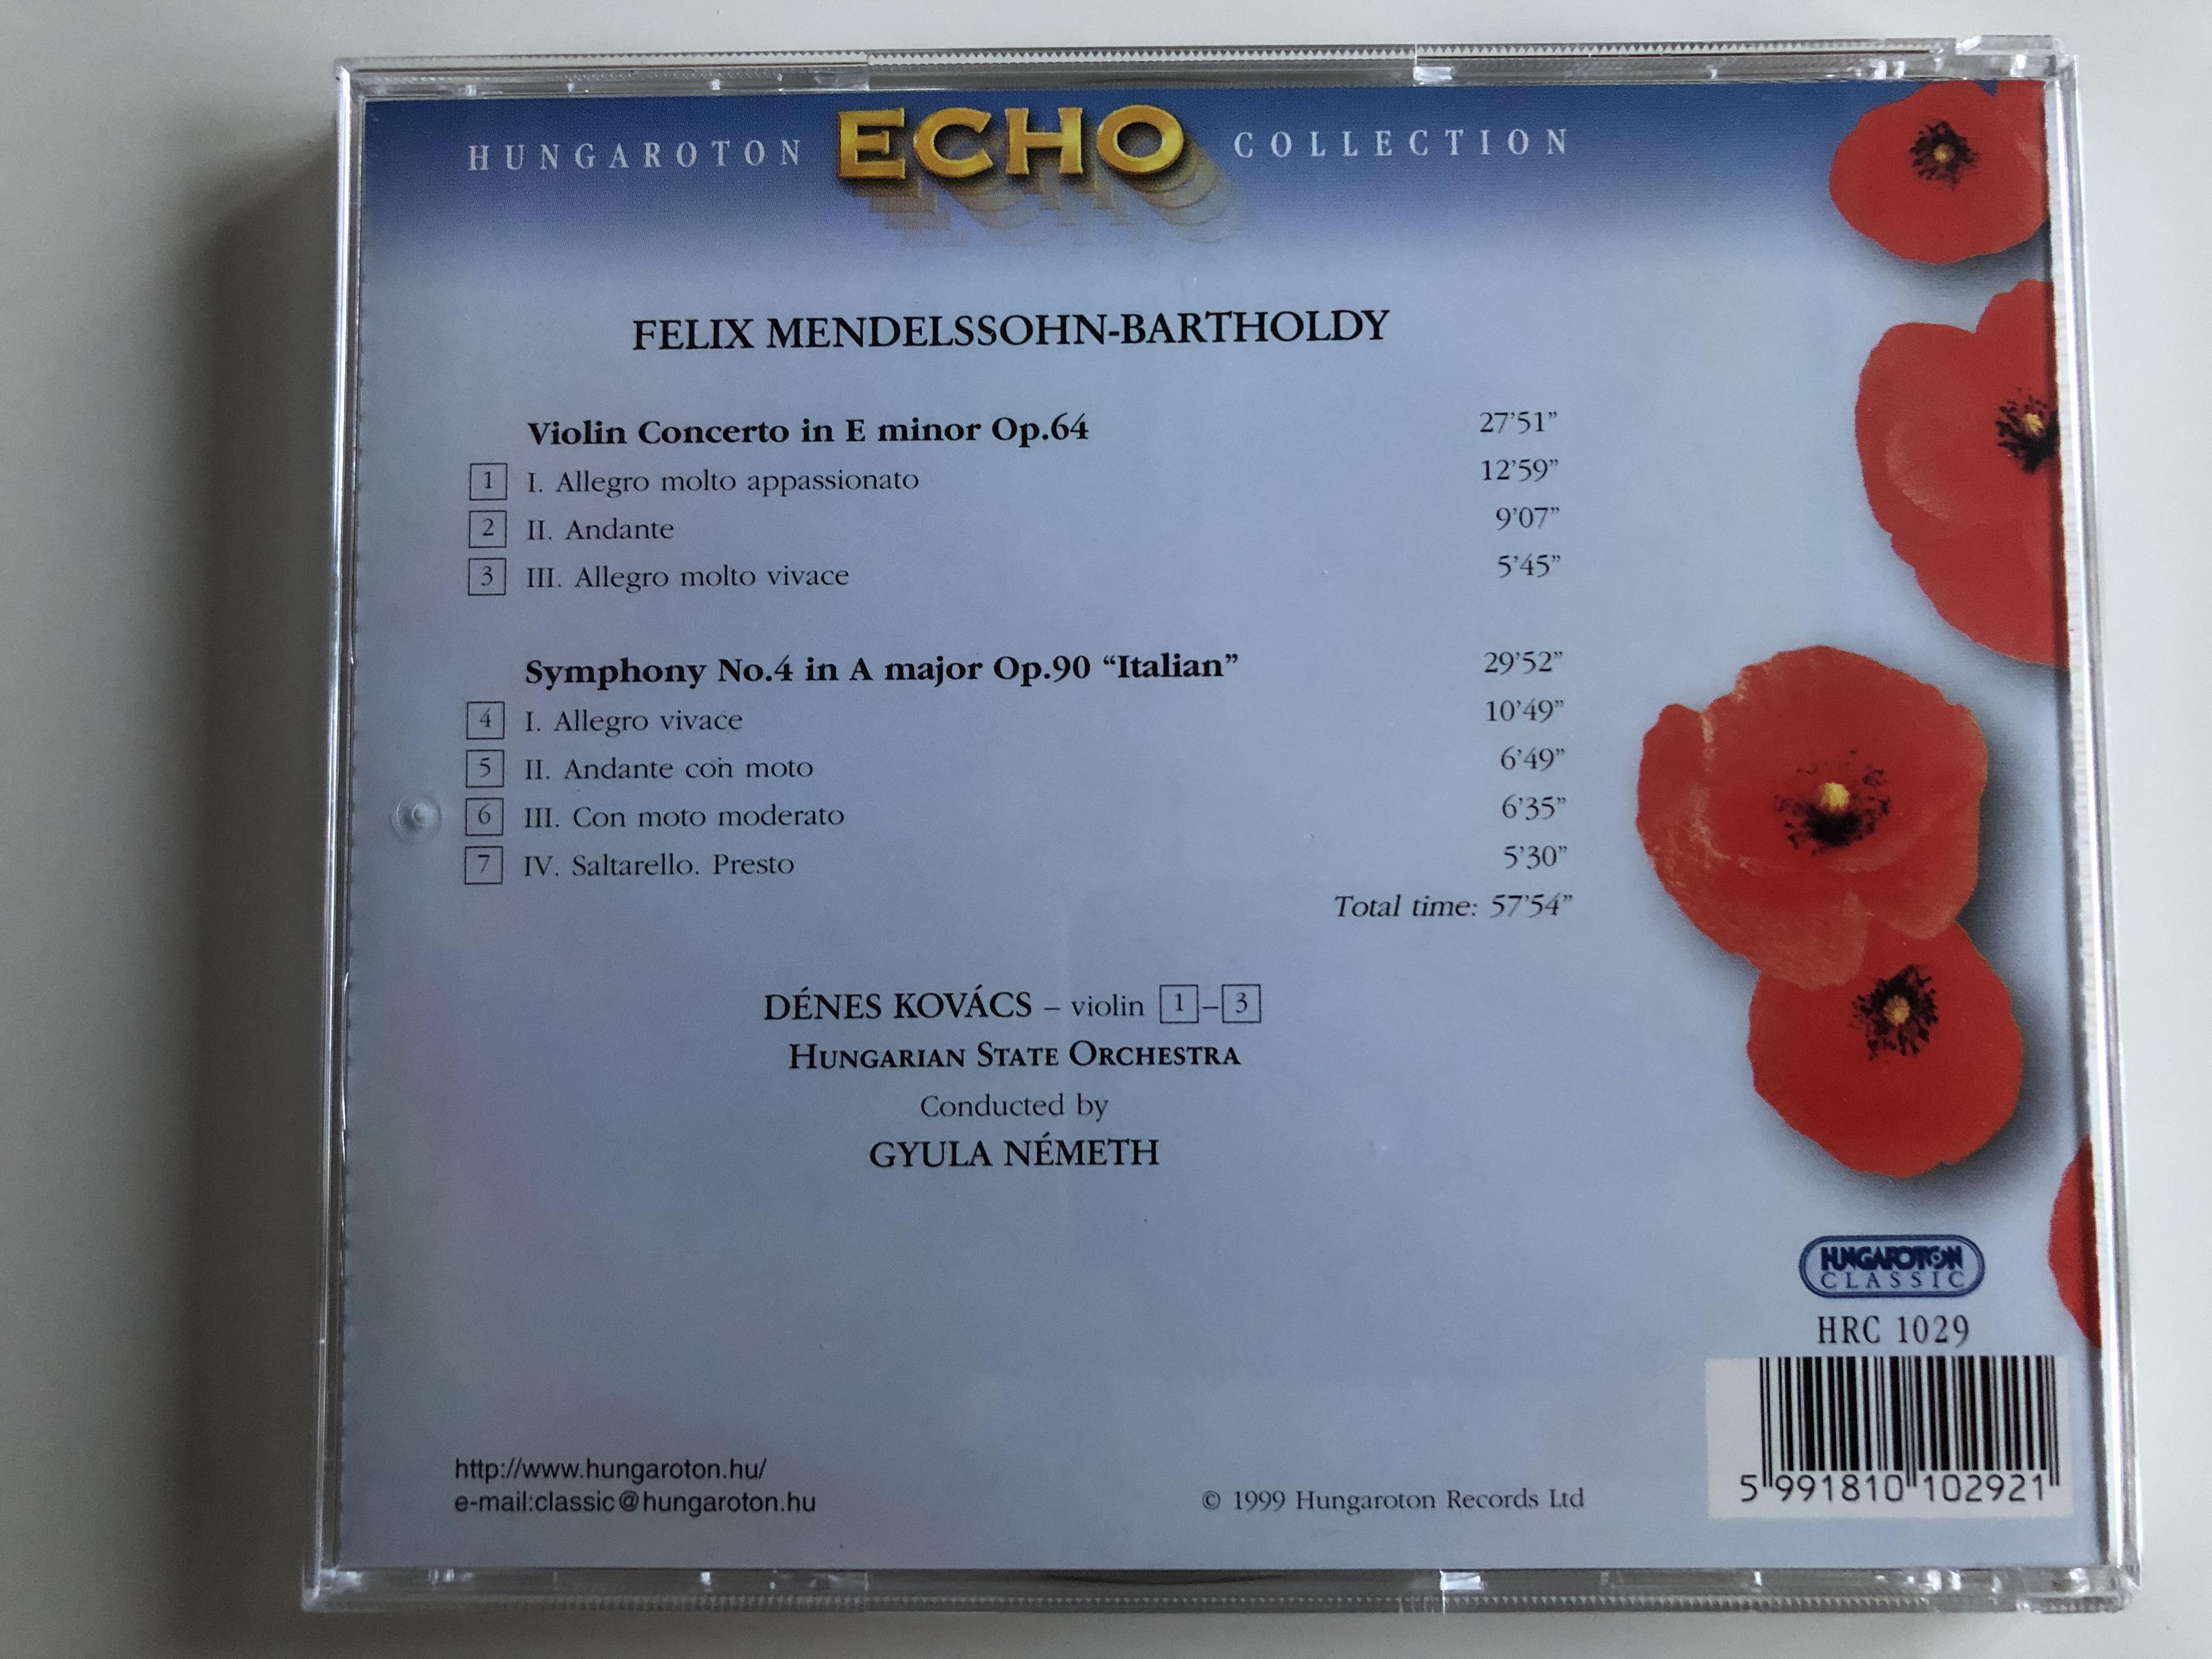 mendelssohn-symphony-no.4-italian-violin-concerto-d-nes-kov-cs-hungarian-state-orchestra-gyula-n-meth-hungaroton-classic-audio-cd-1964-stereo-hrc-1029-4-.jpg